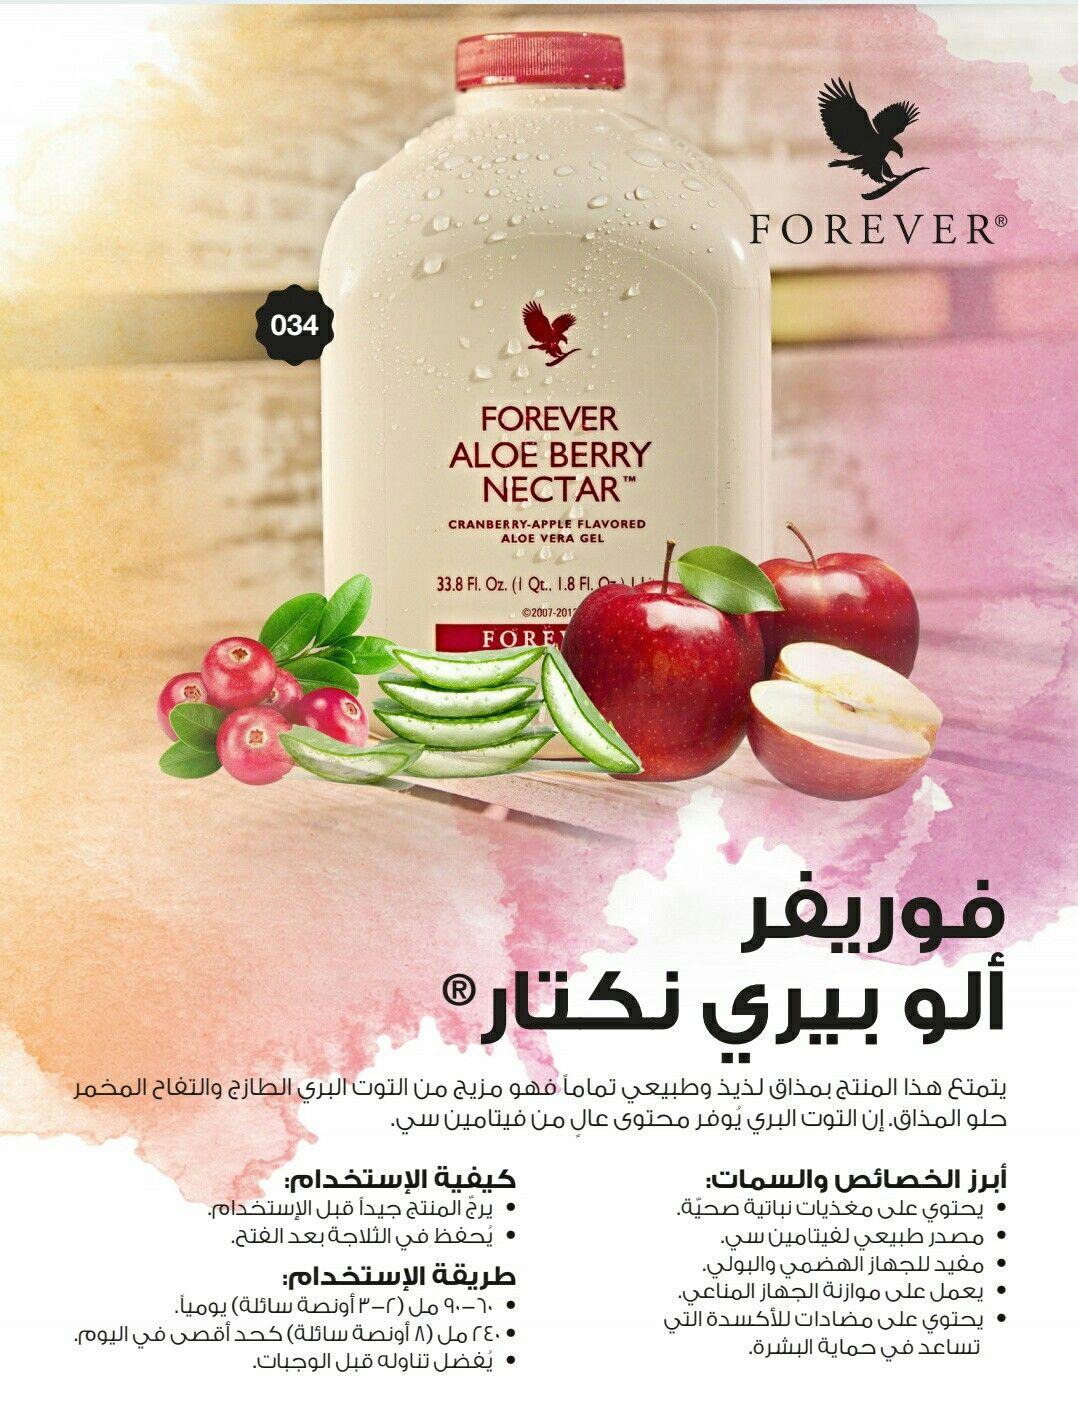 فورايفر الو بيرى نكتار In 2021 Forever Living Products Nutrition Drinks Forever Aloe Berry Nectar